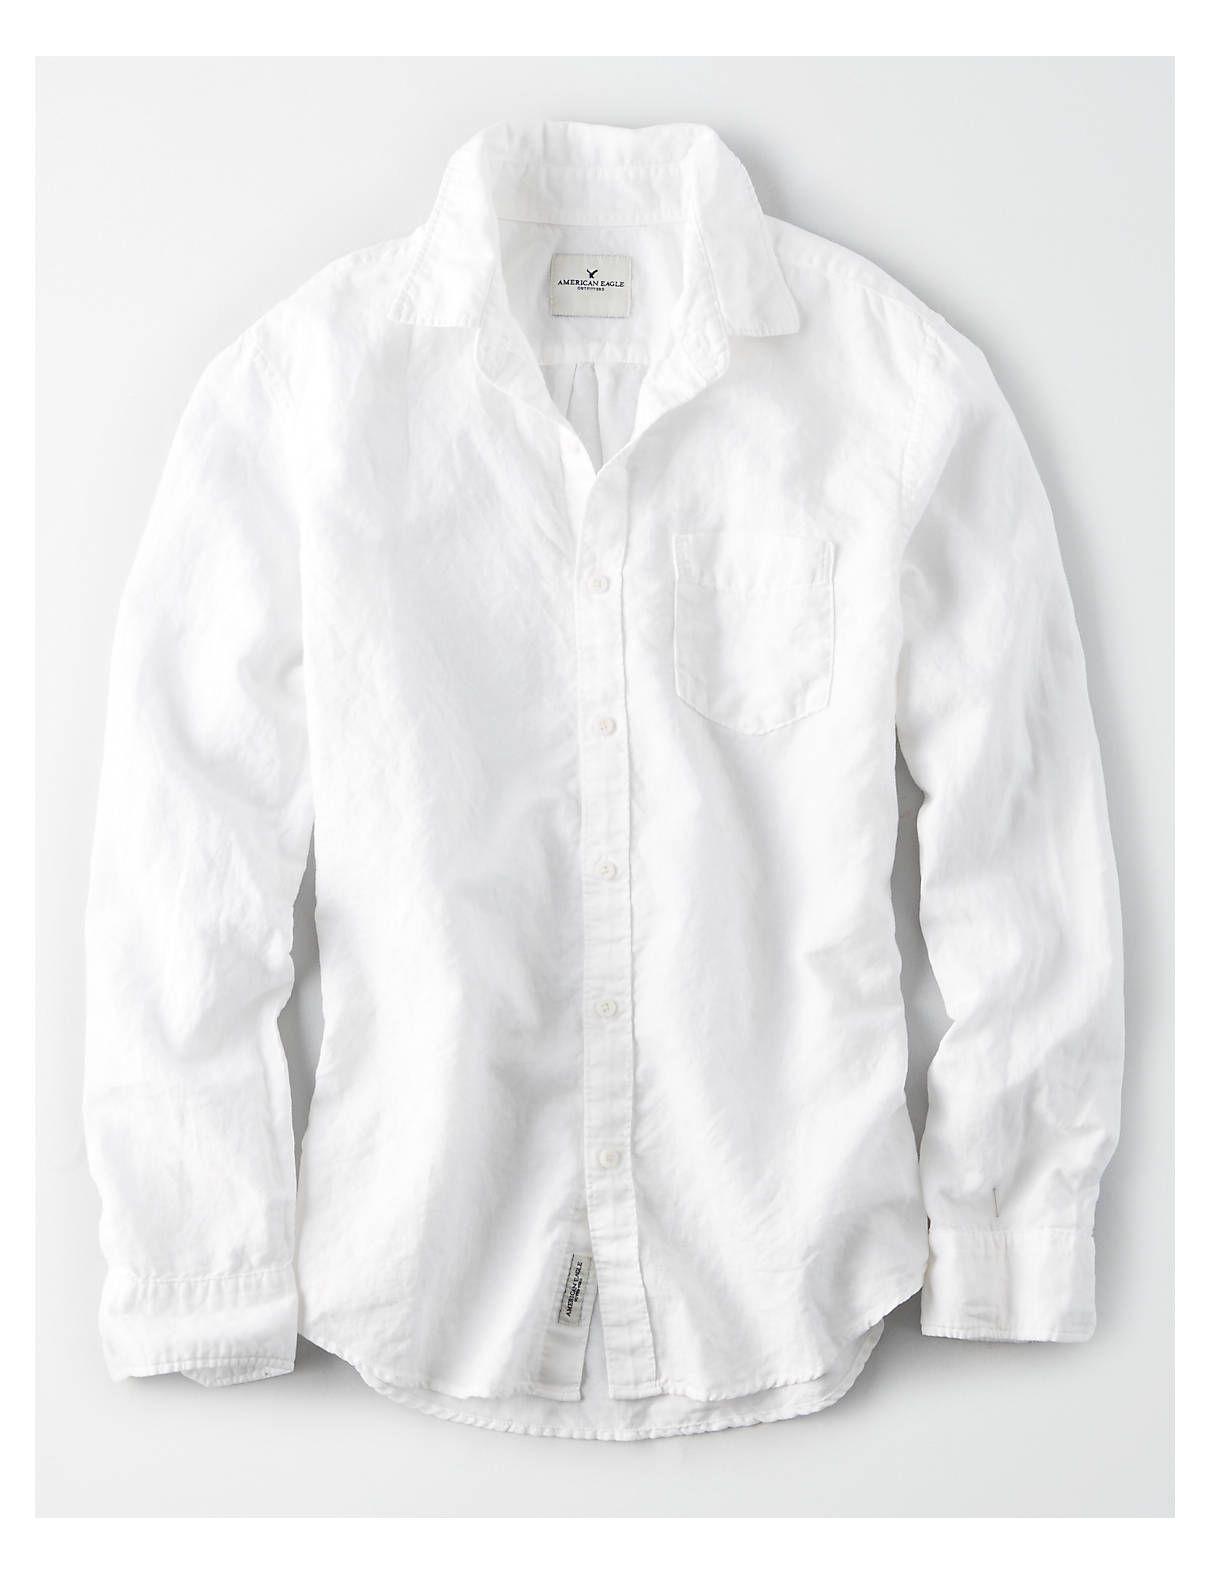 Ae Linen Shirt White American Eagle Outfitters White Shirts Women Casual Shirts For Men White Linen Shirt Men [ 1575 x 1211 Pixel ]